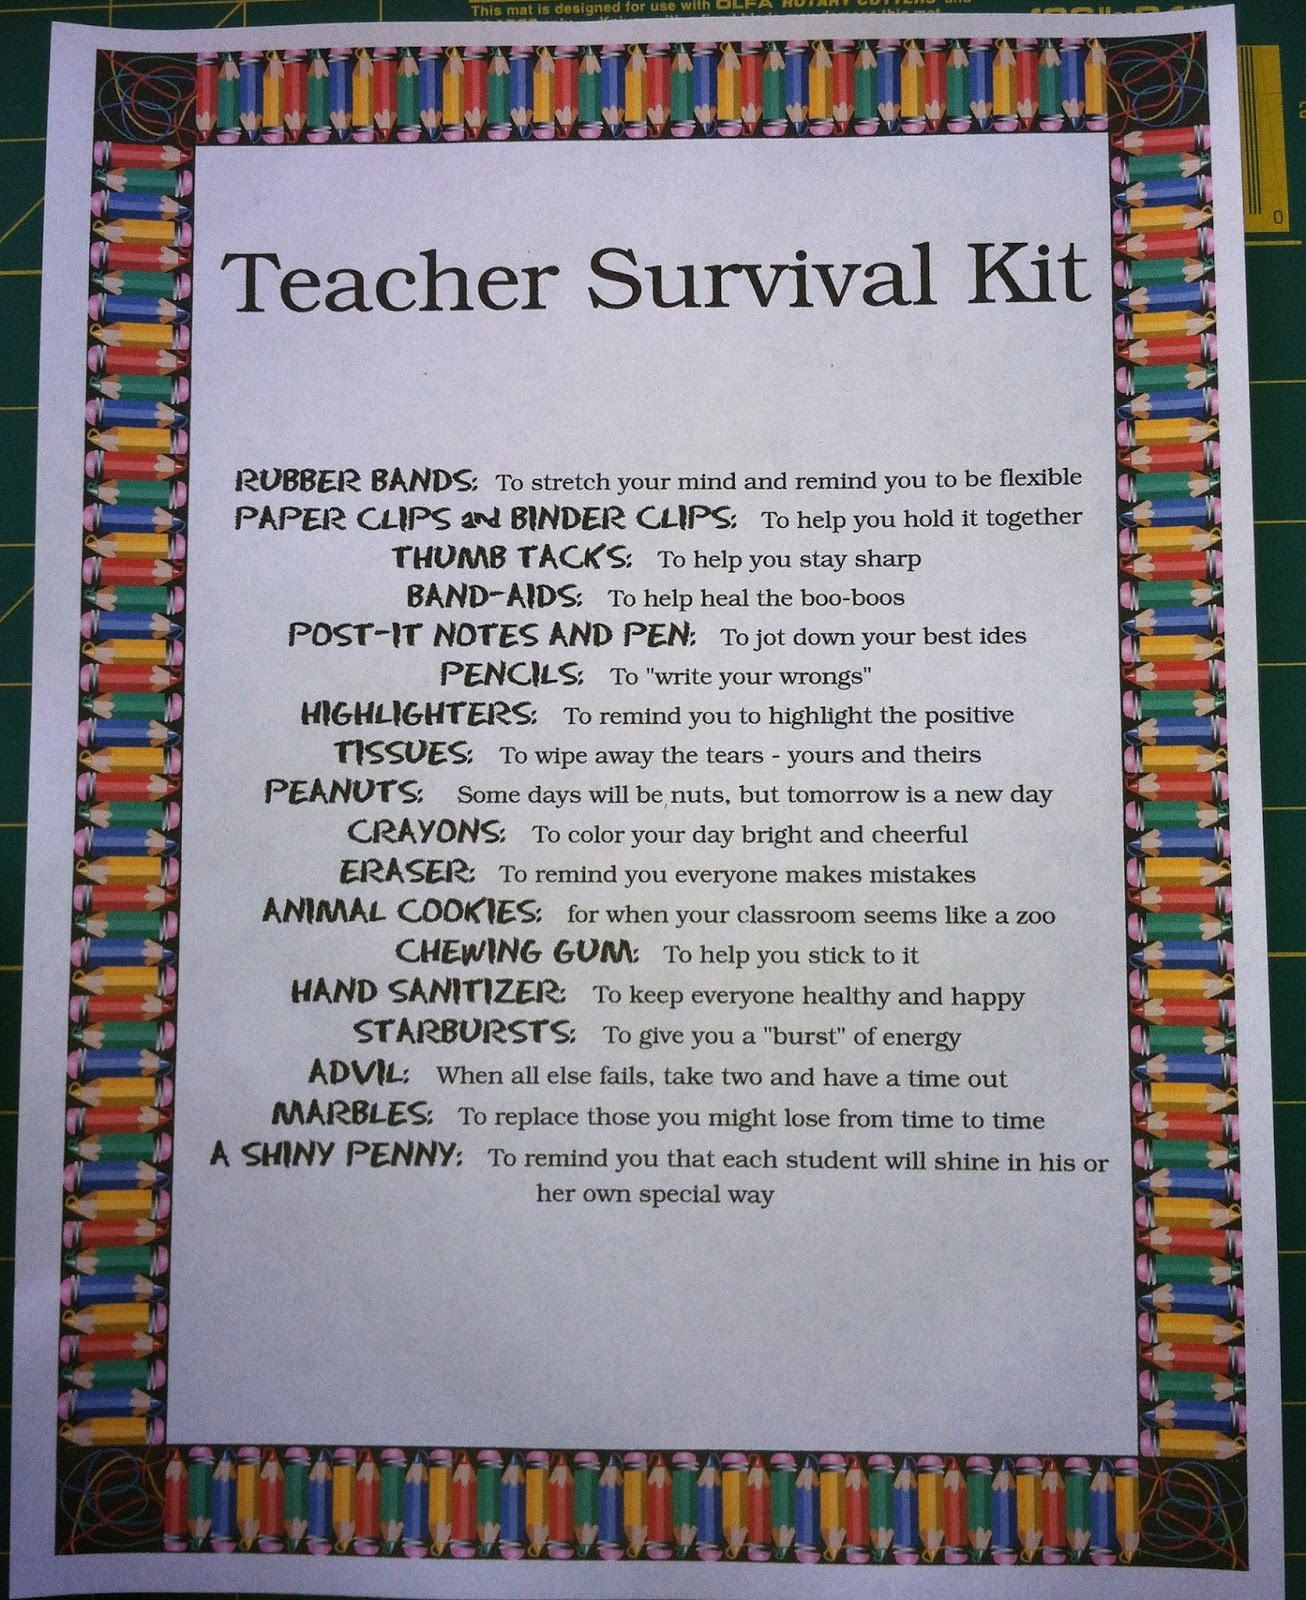 For The Joy of Creating: Teacher Back To School Survival Kit